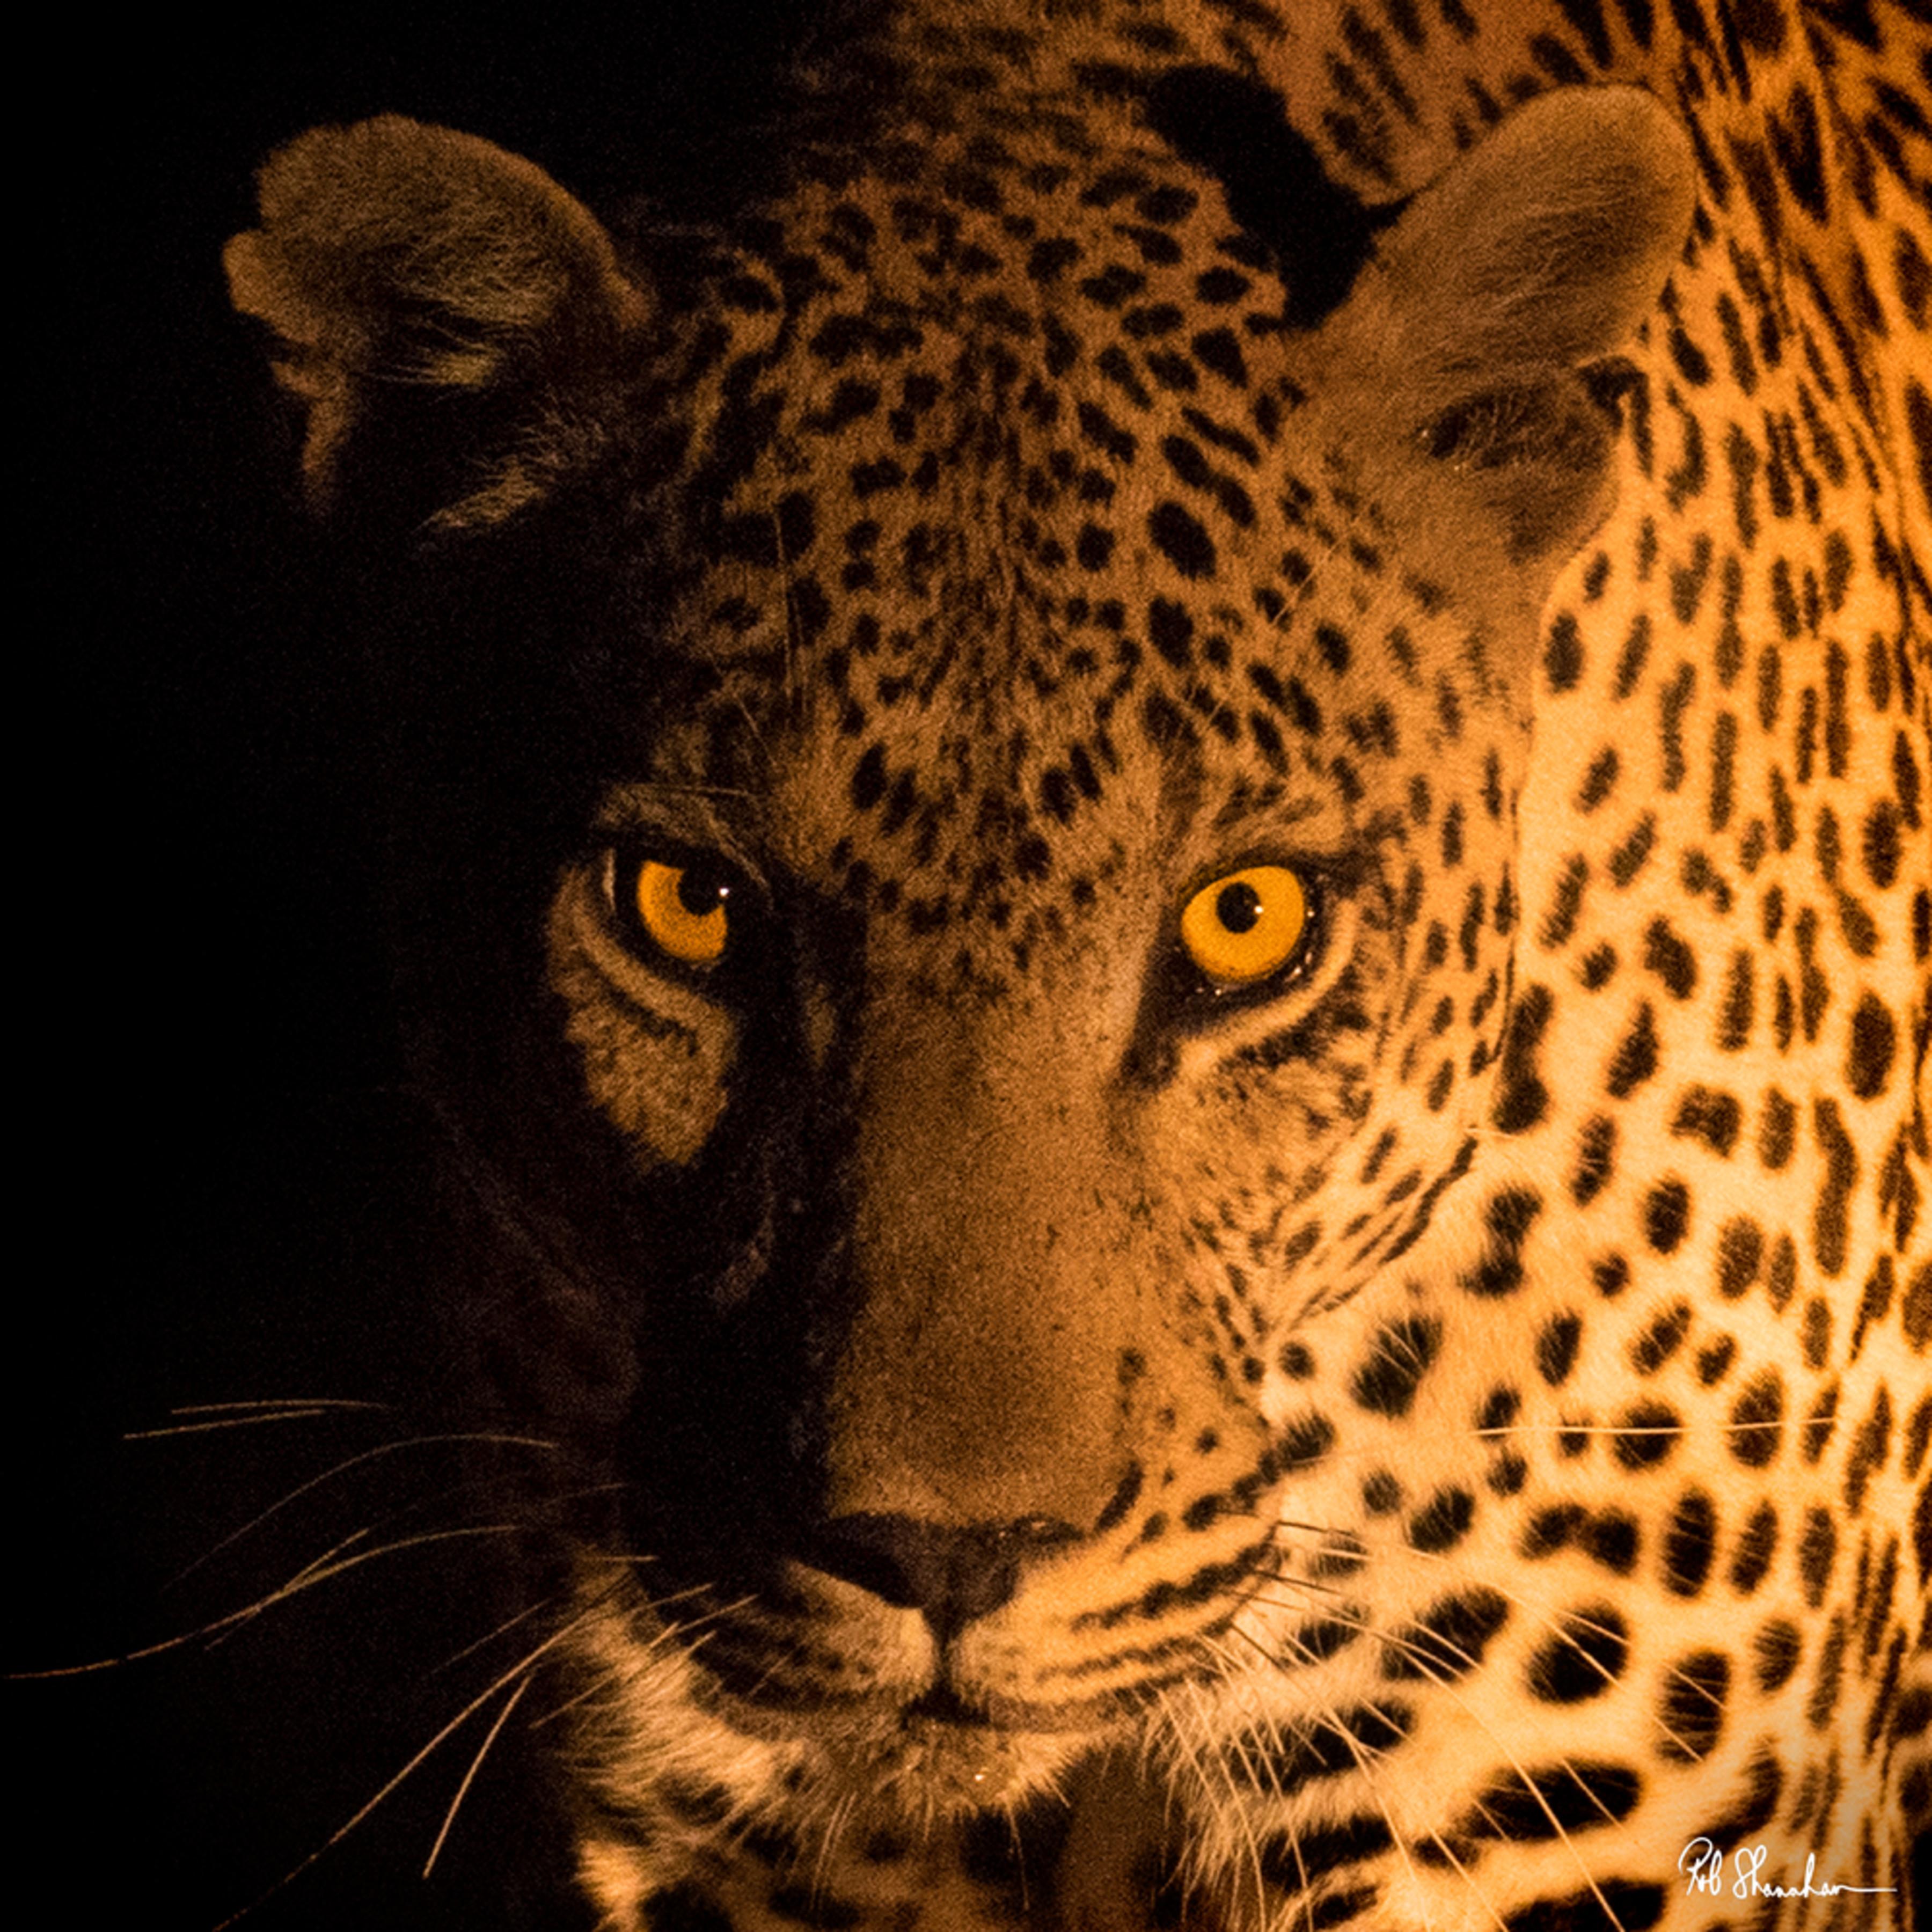 Leopard stare square 12x12 sig fktoak